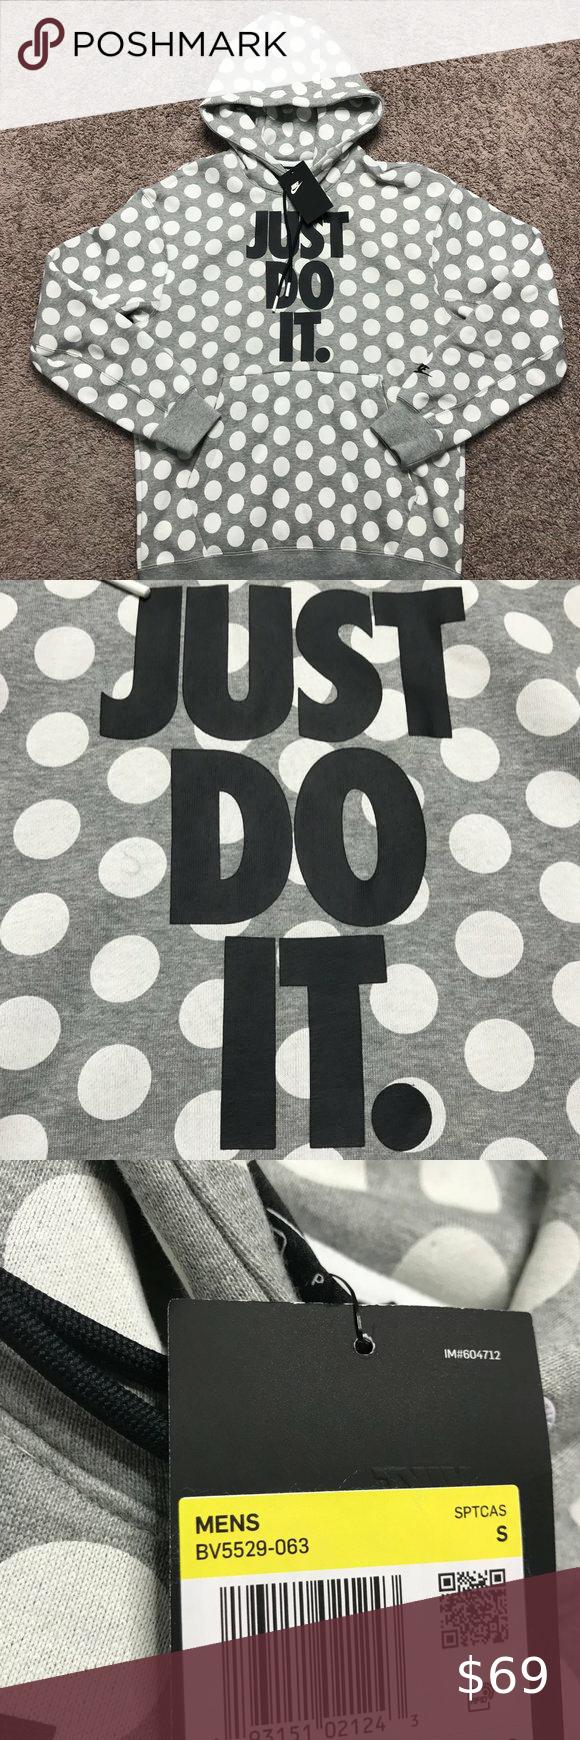 Nike Sportswear Nsw Just Do It Polka Dot Pullover Nike Sportswear Nsw Just Do It Jdi Polka Dot Pullover Hoodie Size Men Nike Sportswear Sportswear Polka Dots [ 1740 x 580 Pixel ]